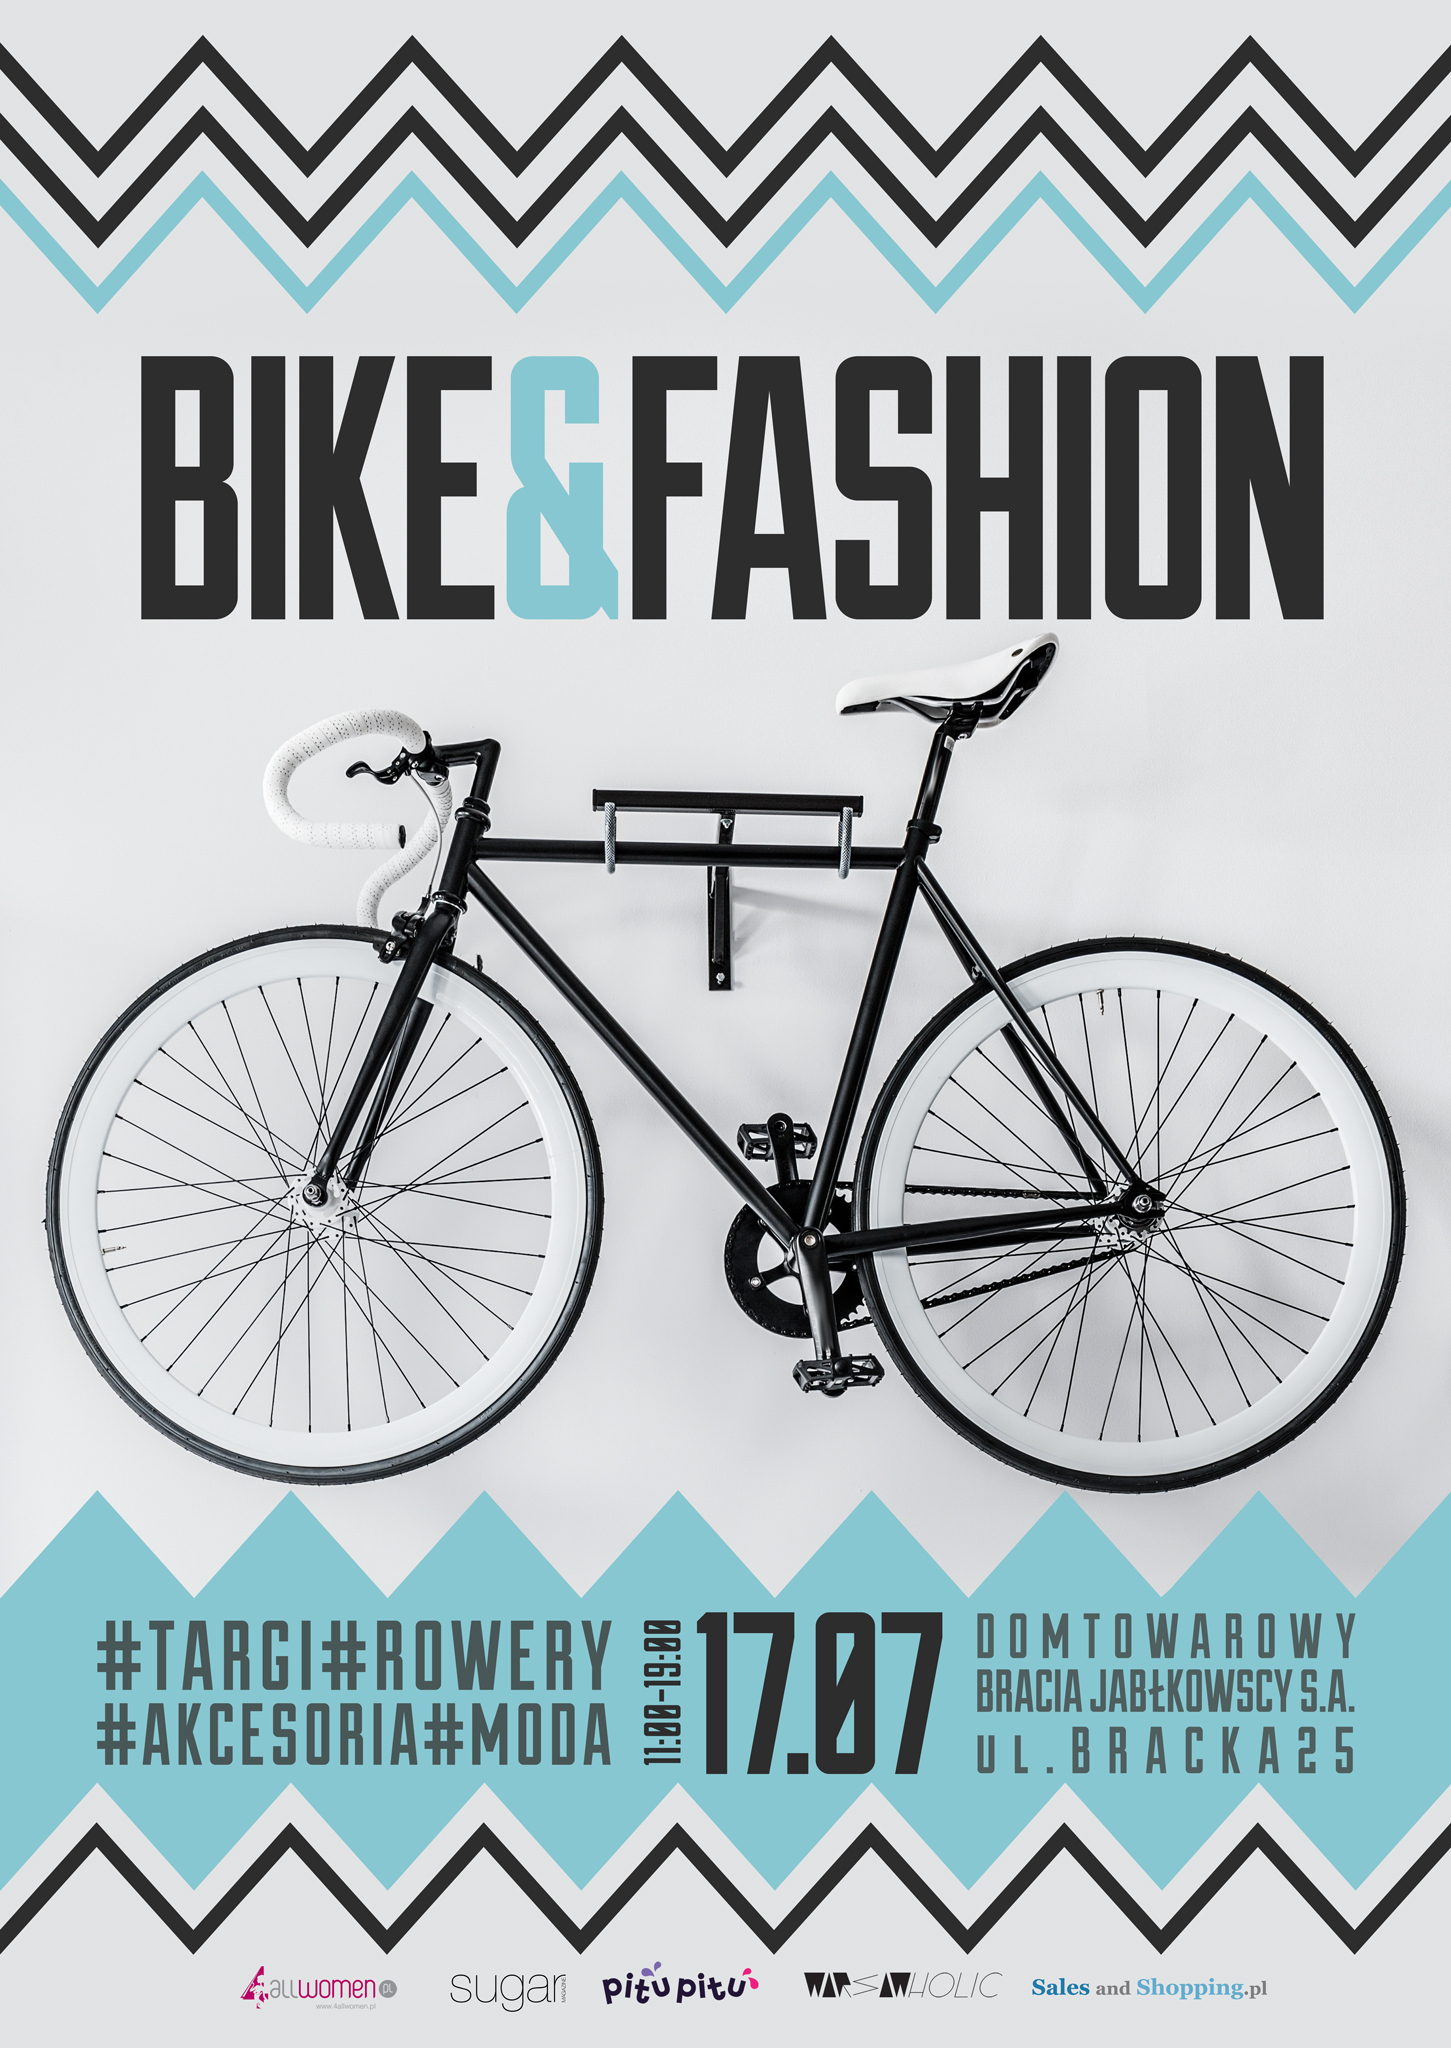 Targi Rowerowo-Modowe Bike & Fashion in Warsaw 17 lipca 2016